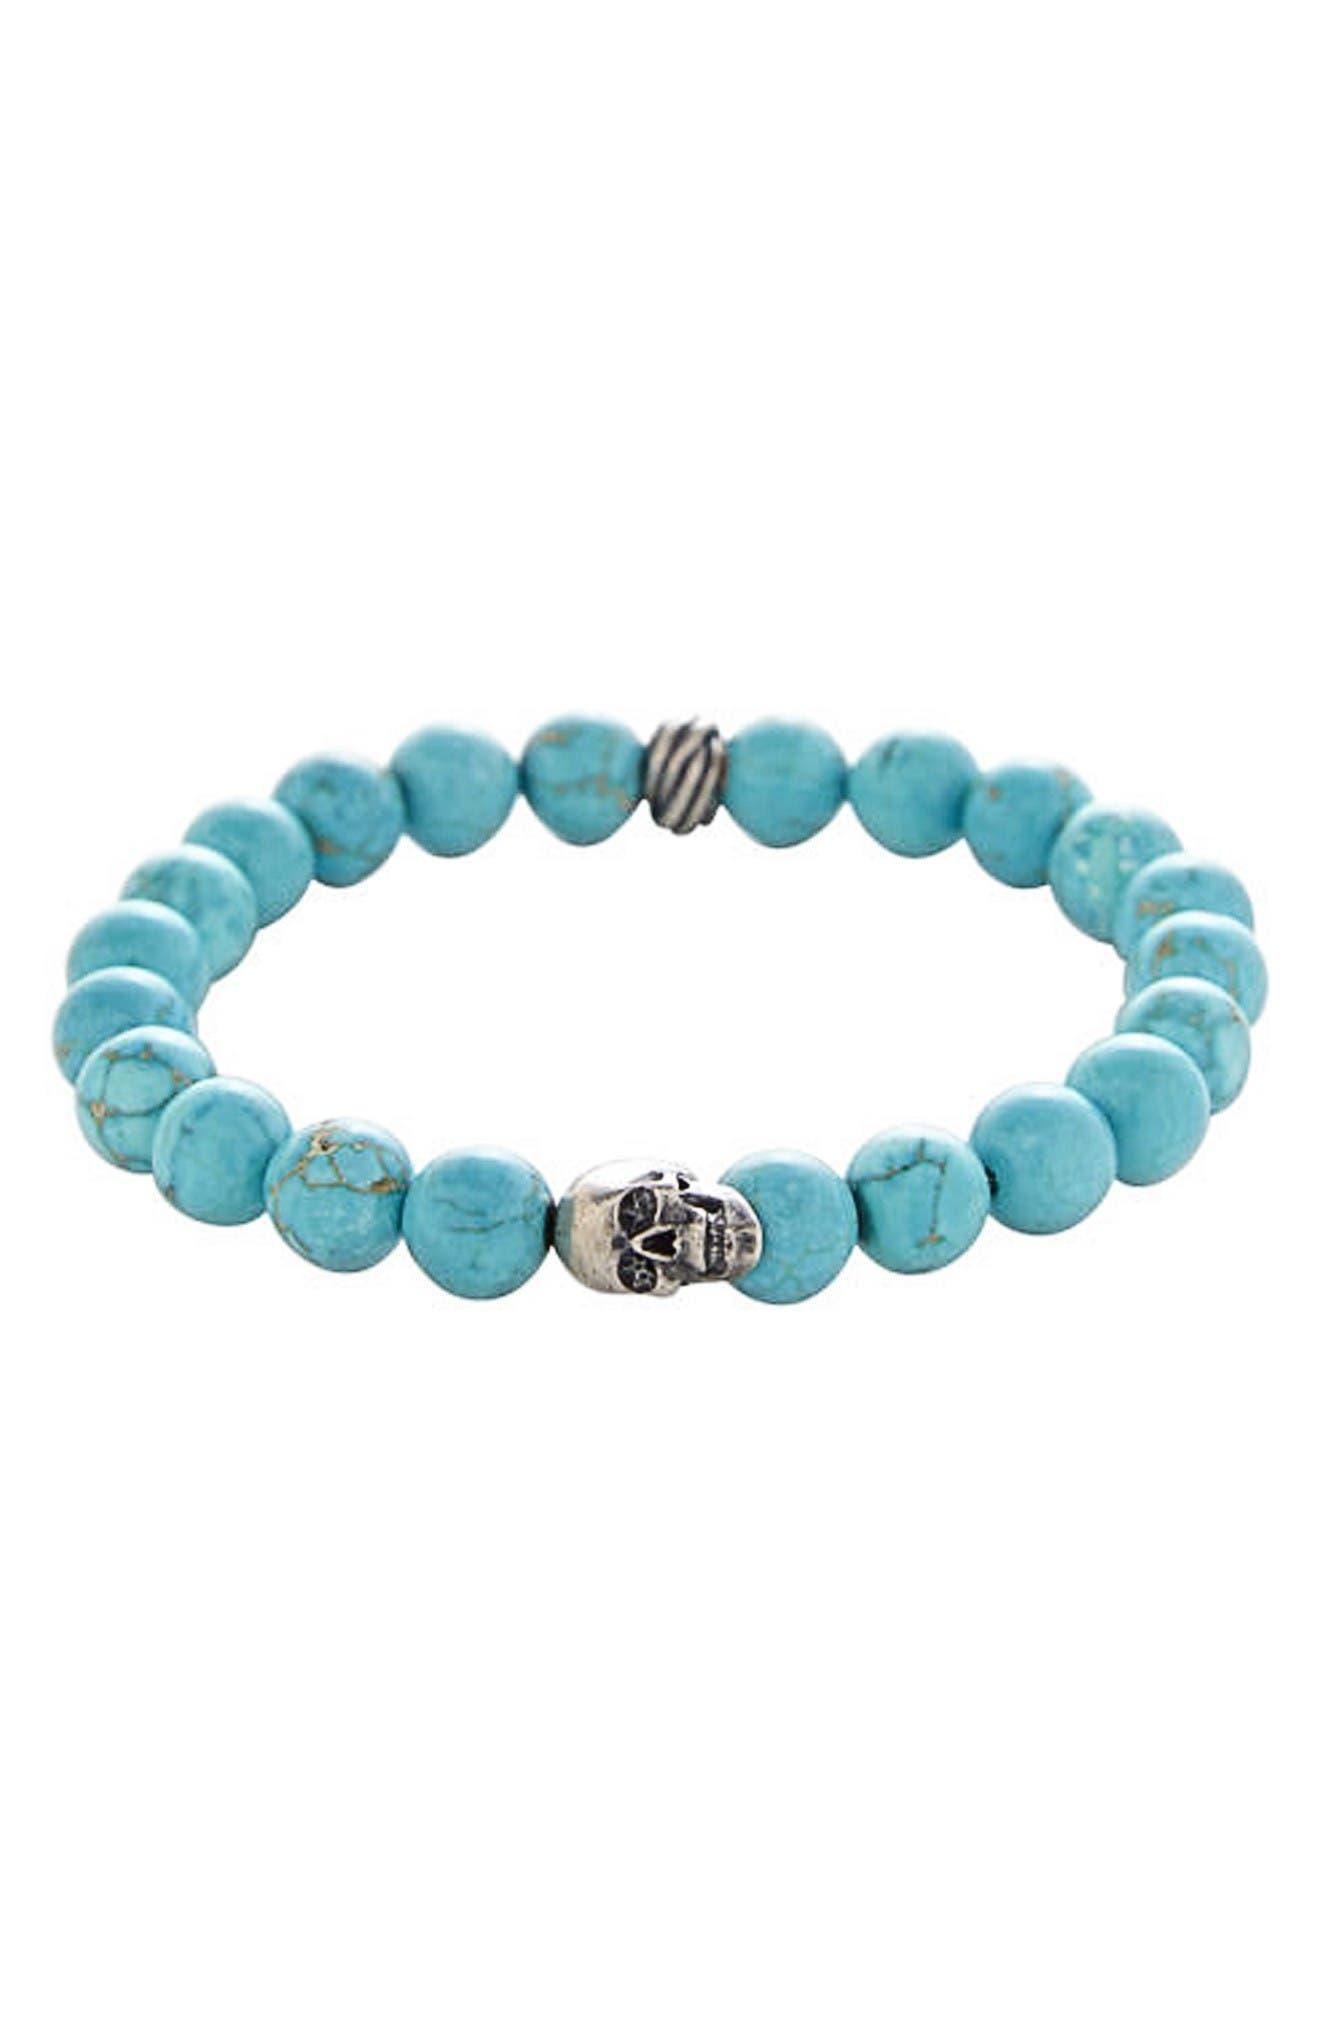 Stone Bead Stretch Bracelet,                         Main,                         color, Blue